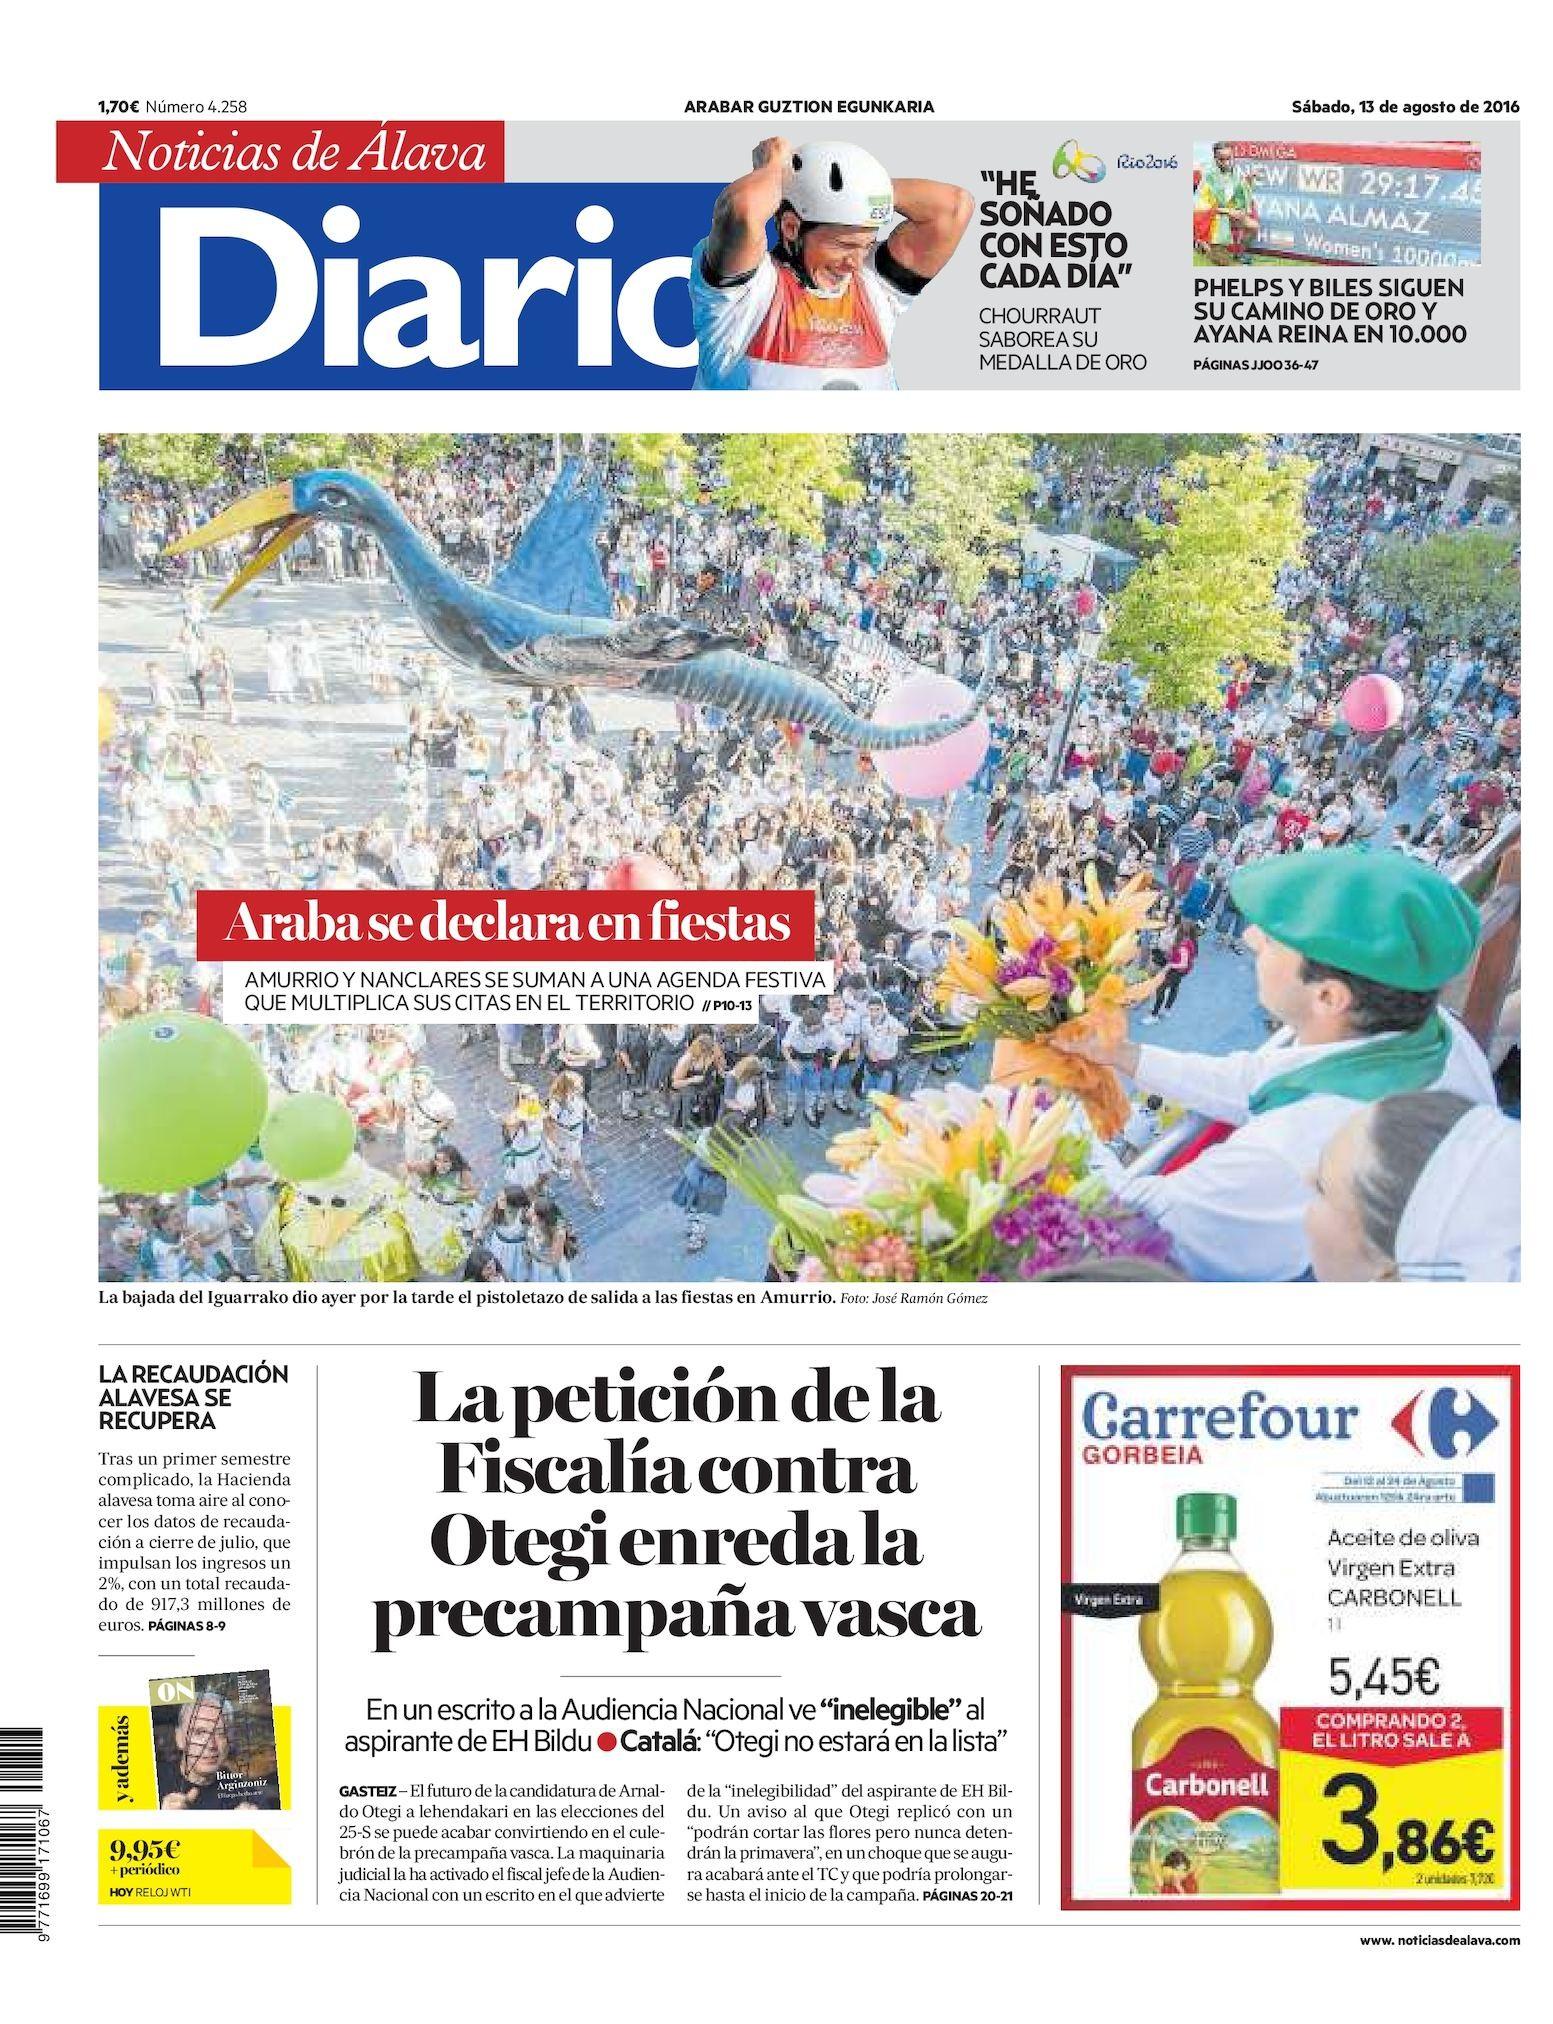 Calendario 2019 Con Festivos Castilla La Mancha Actual Calaméo Diario De Noticias De lava